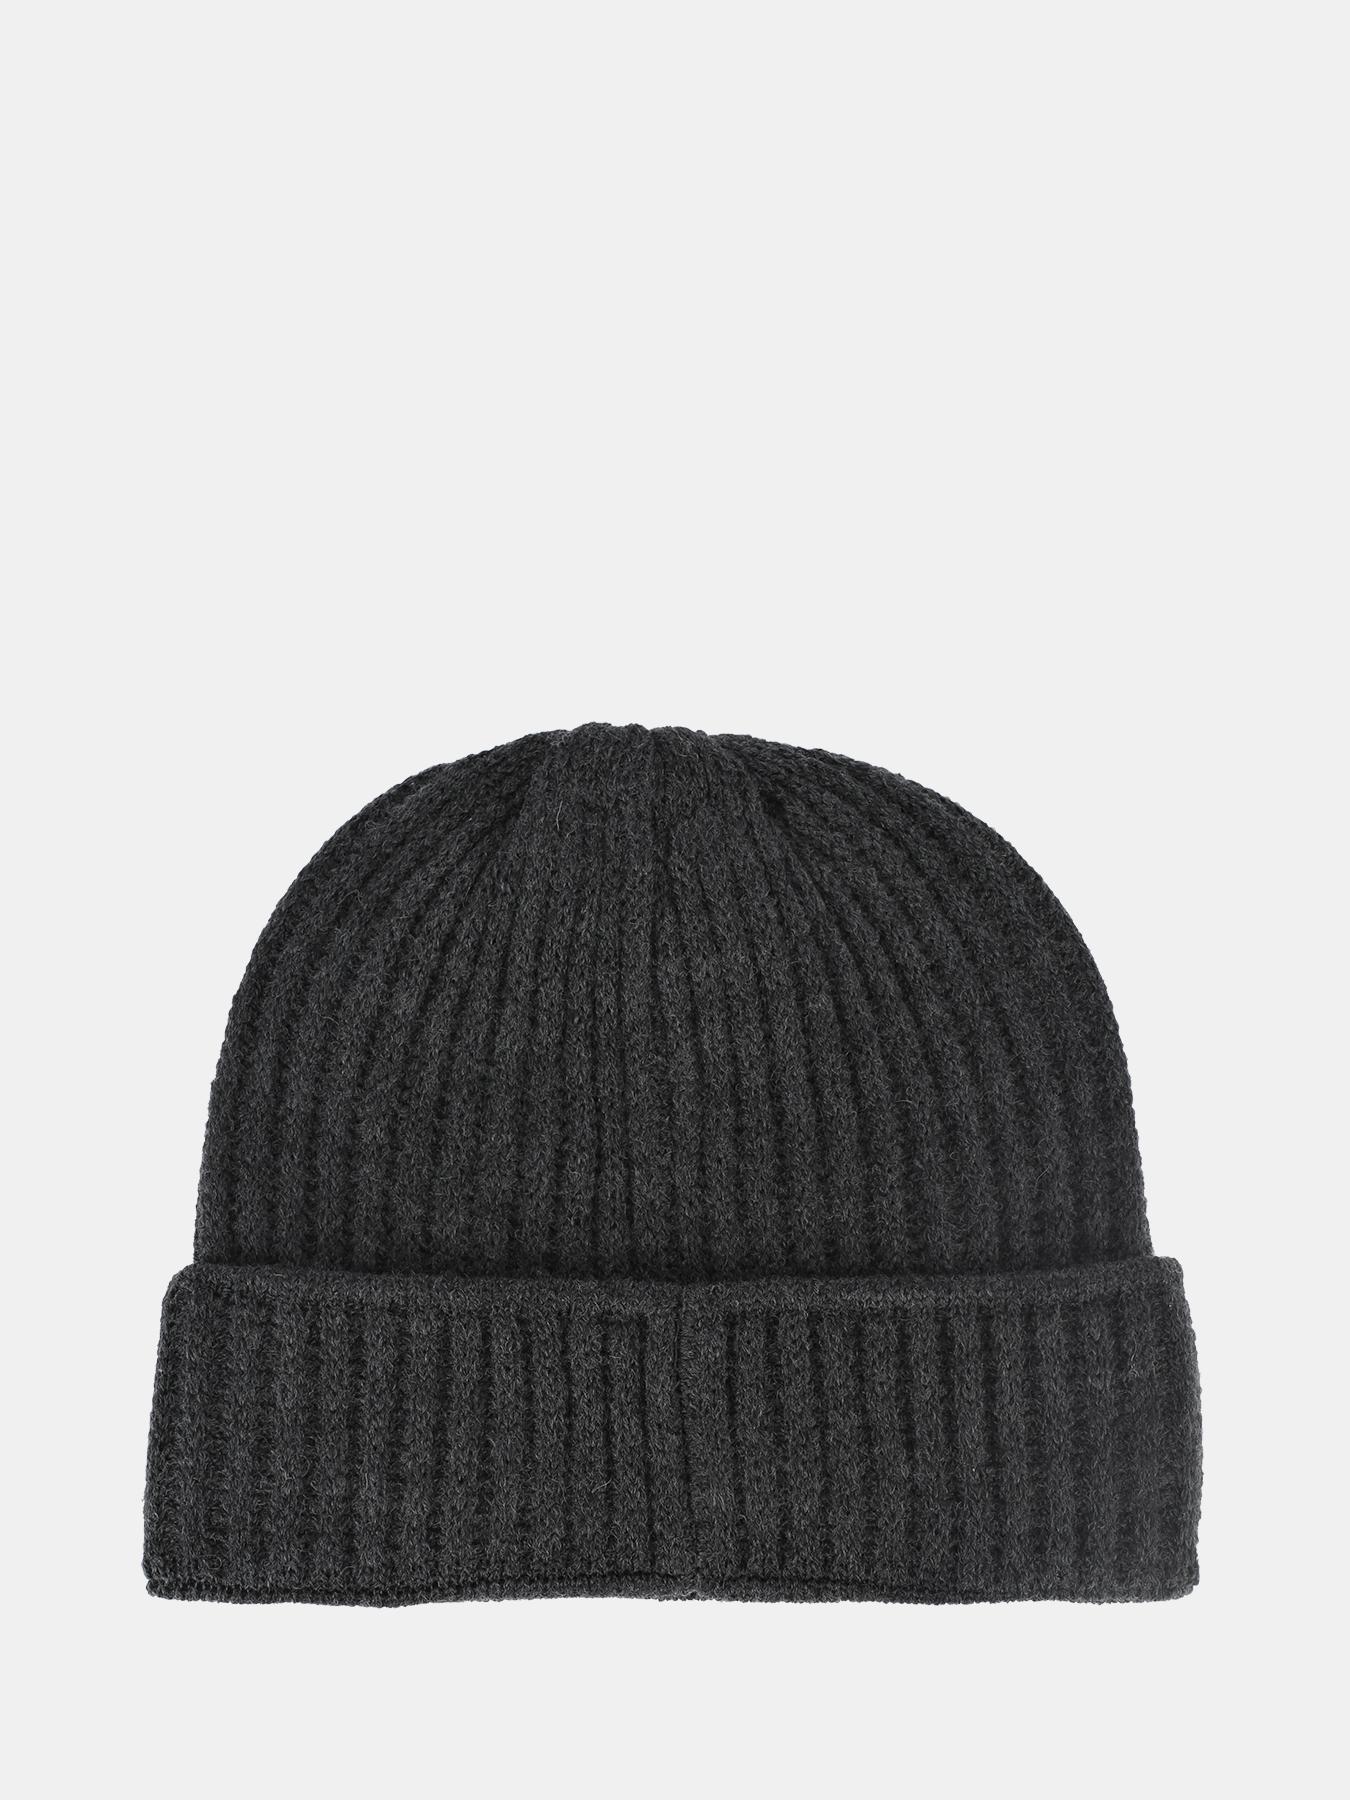 Шапка Ritter Мужская шапка мужская шапка quiksilver m